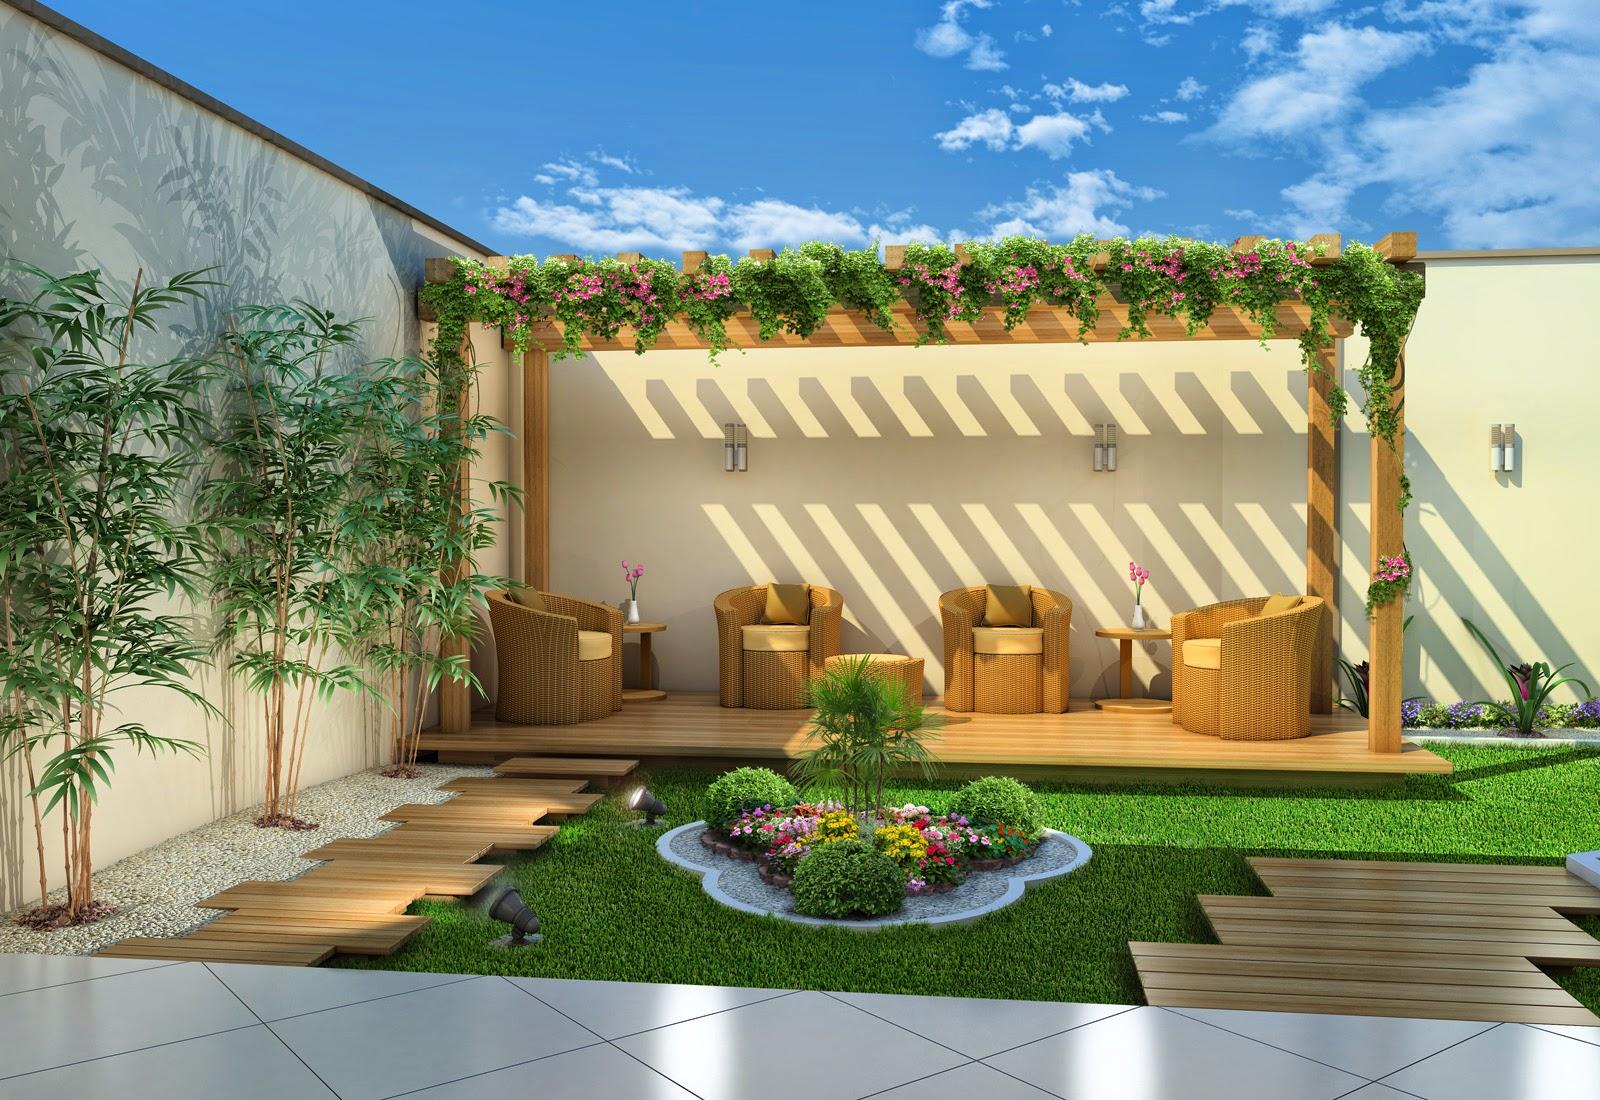 Salas de jantar: ideias para decorar o ambiente - BOL